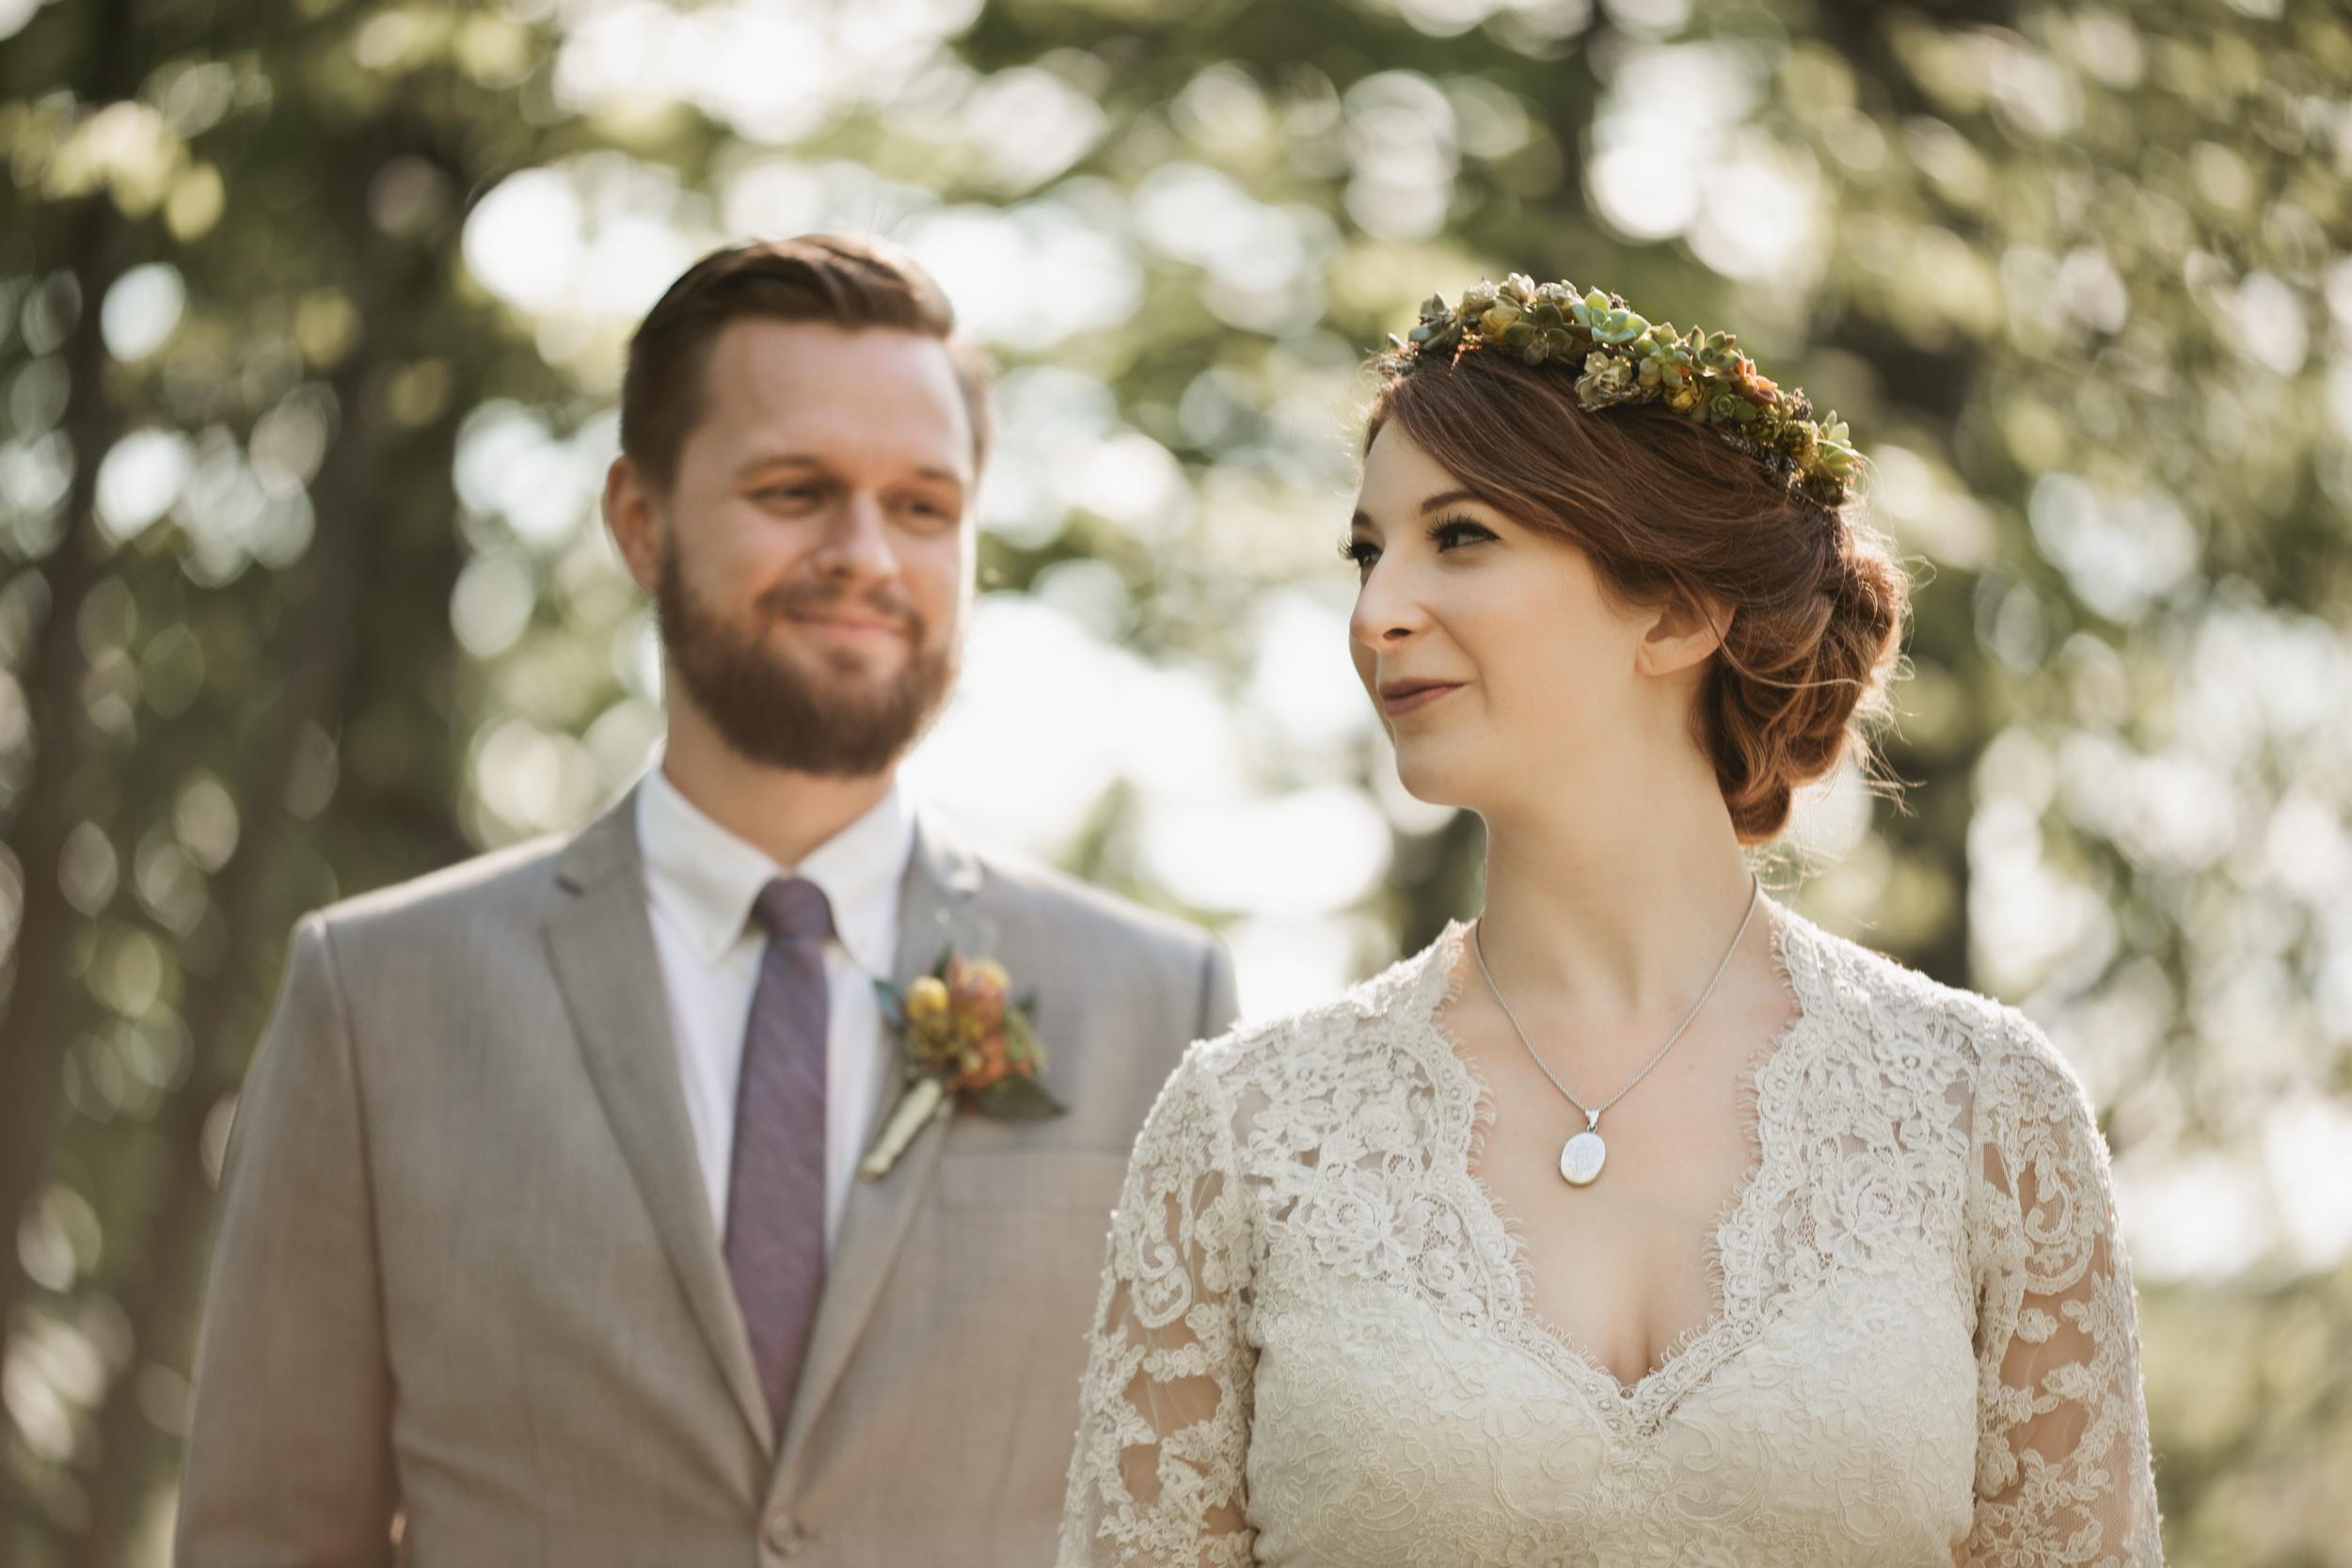 Spring-Meadows-Maine-Wedding-146.jpg